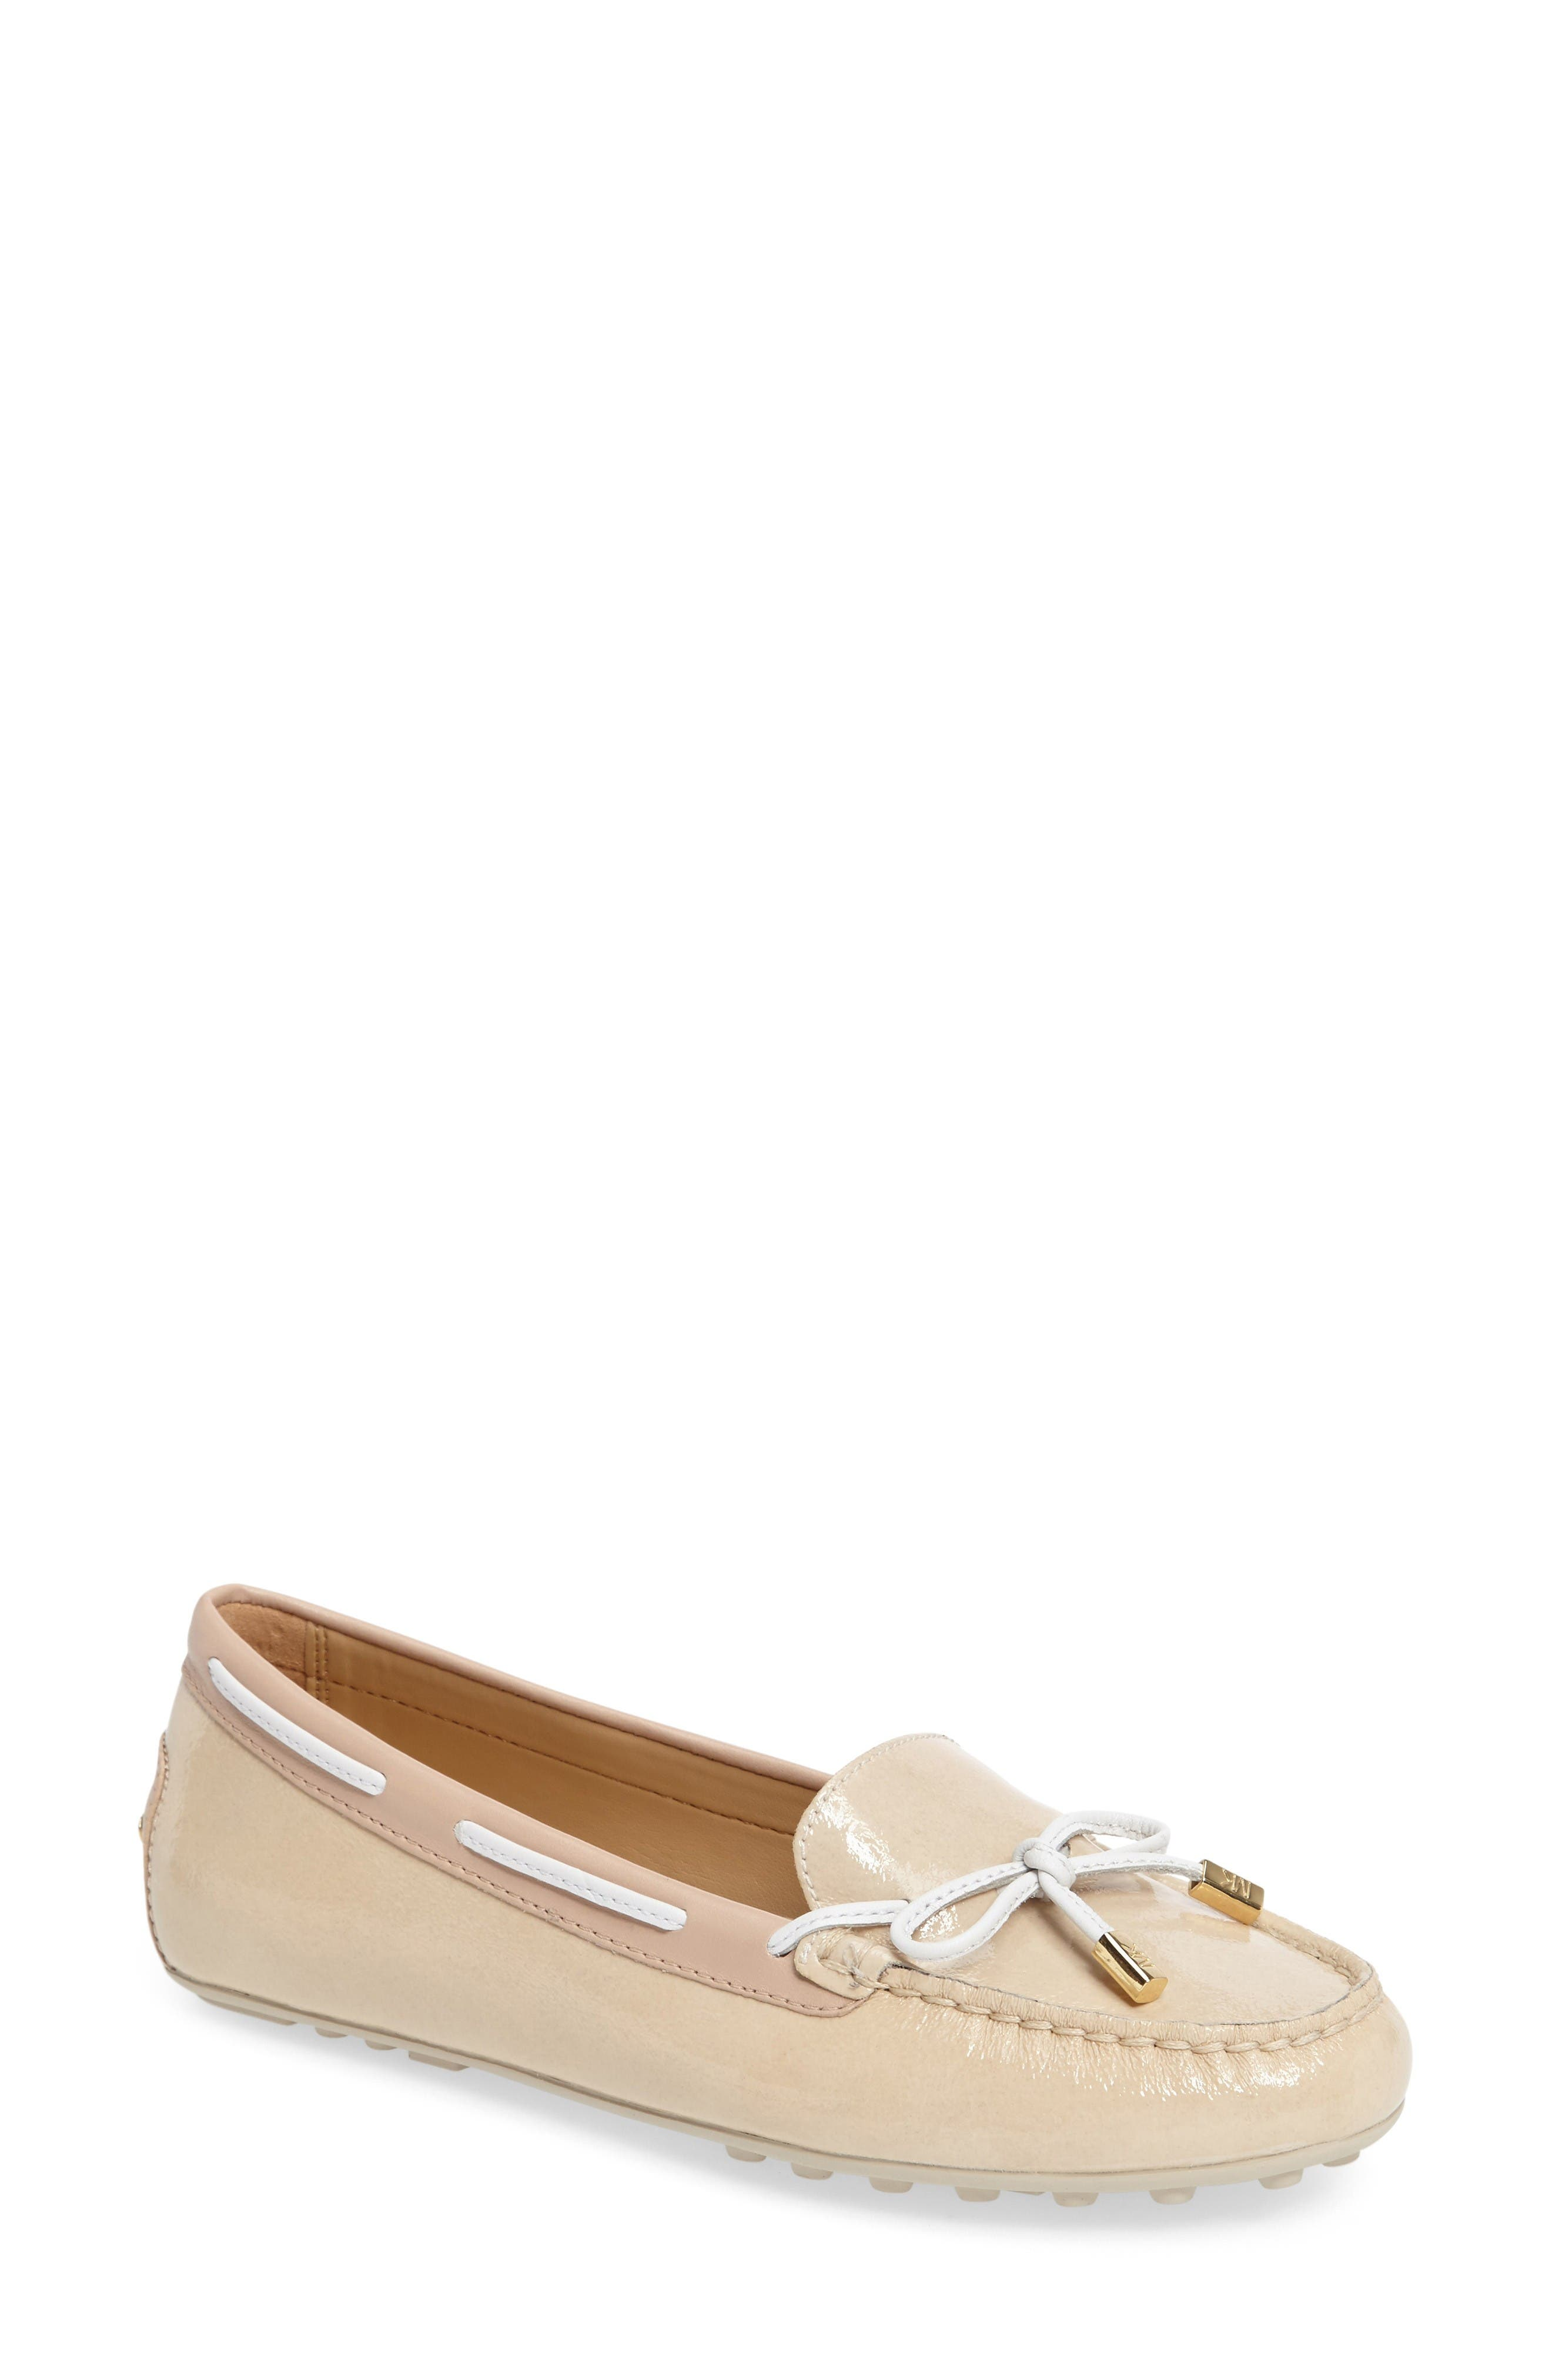 Womens Michael Kors Daisy Moc Navy Casual Shoes Z19537